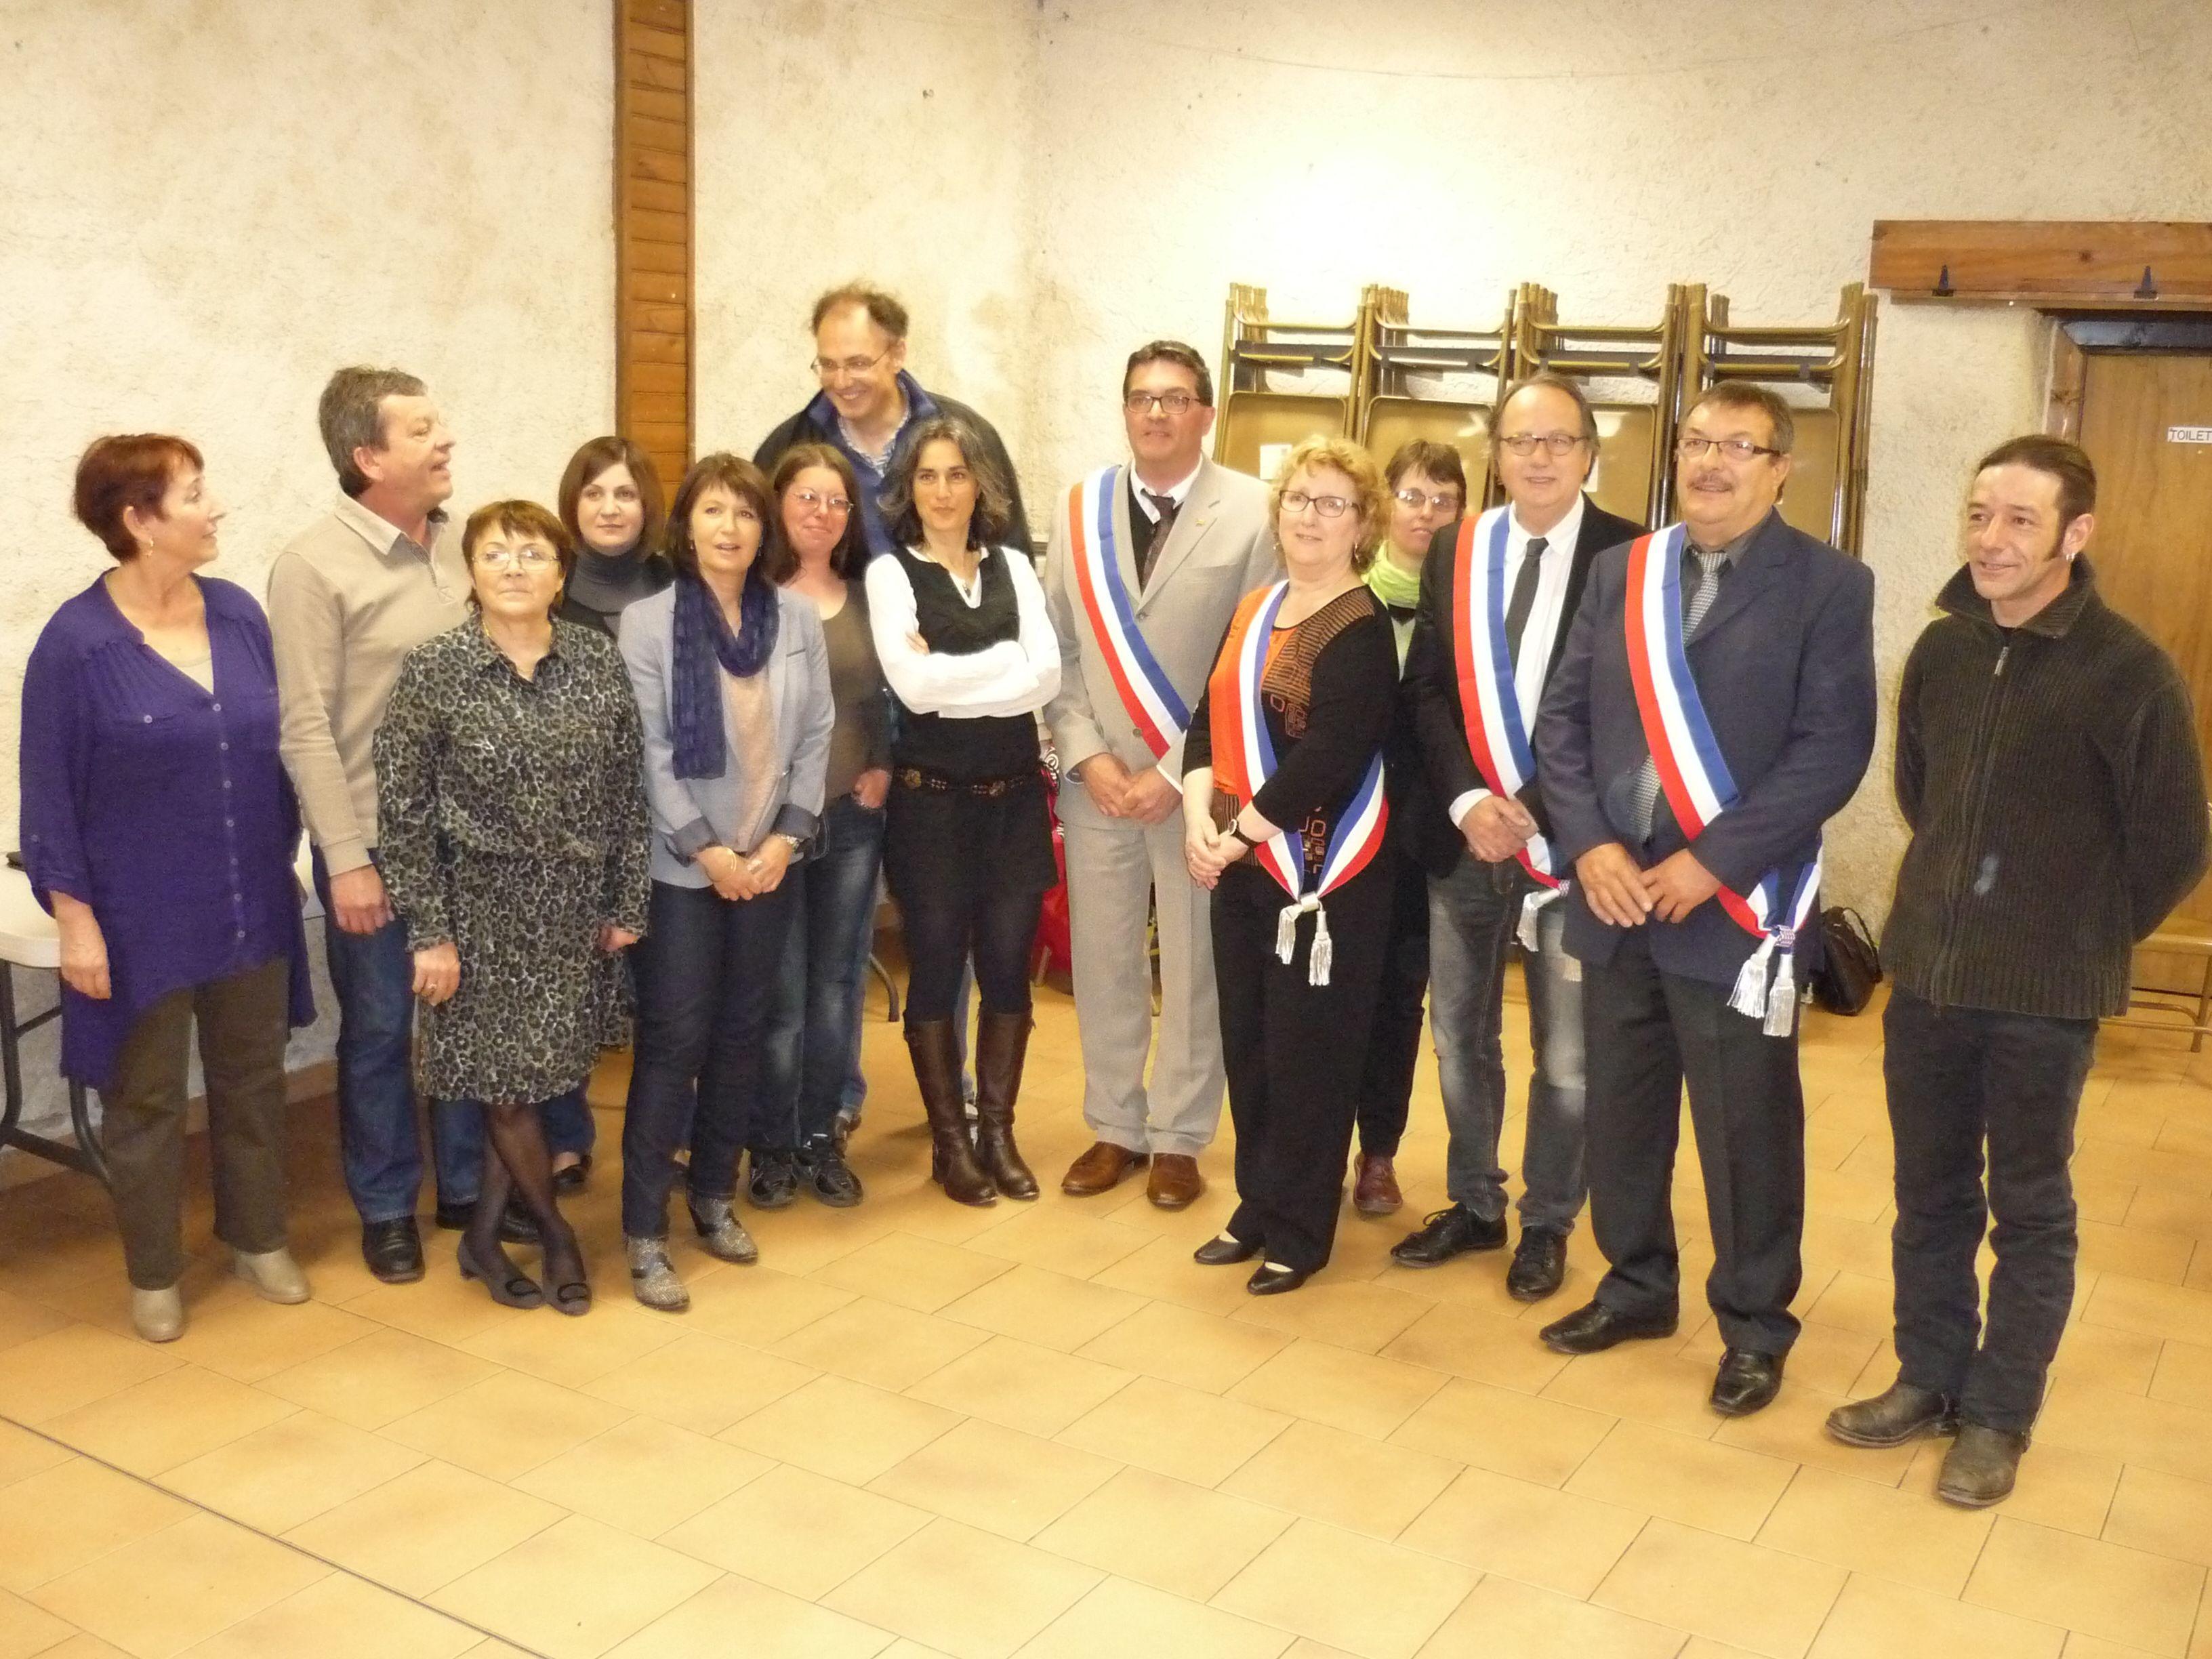 759-clp-trausse-conseil-municipal